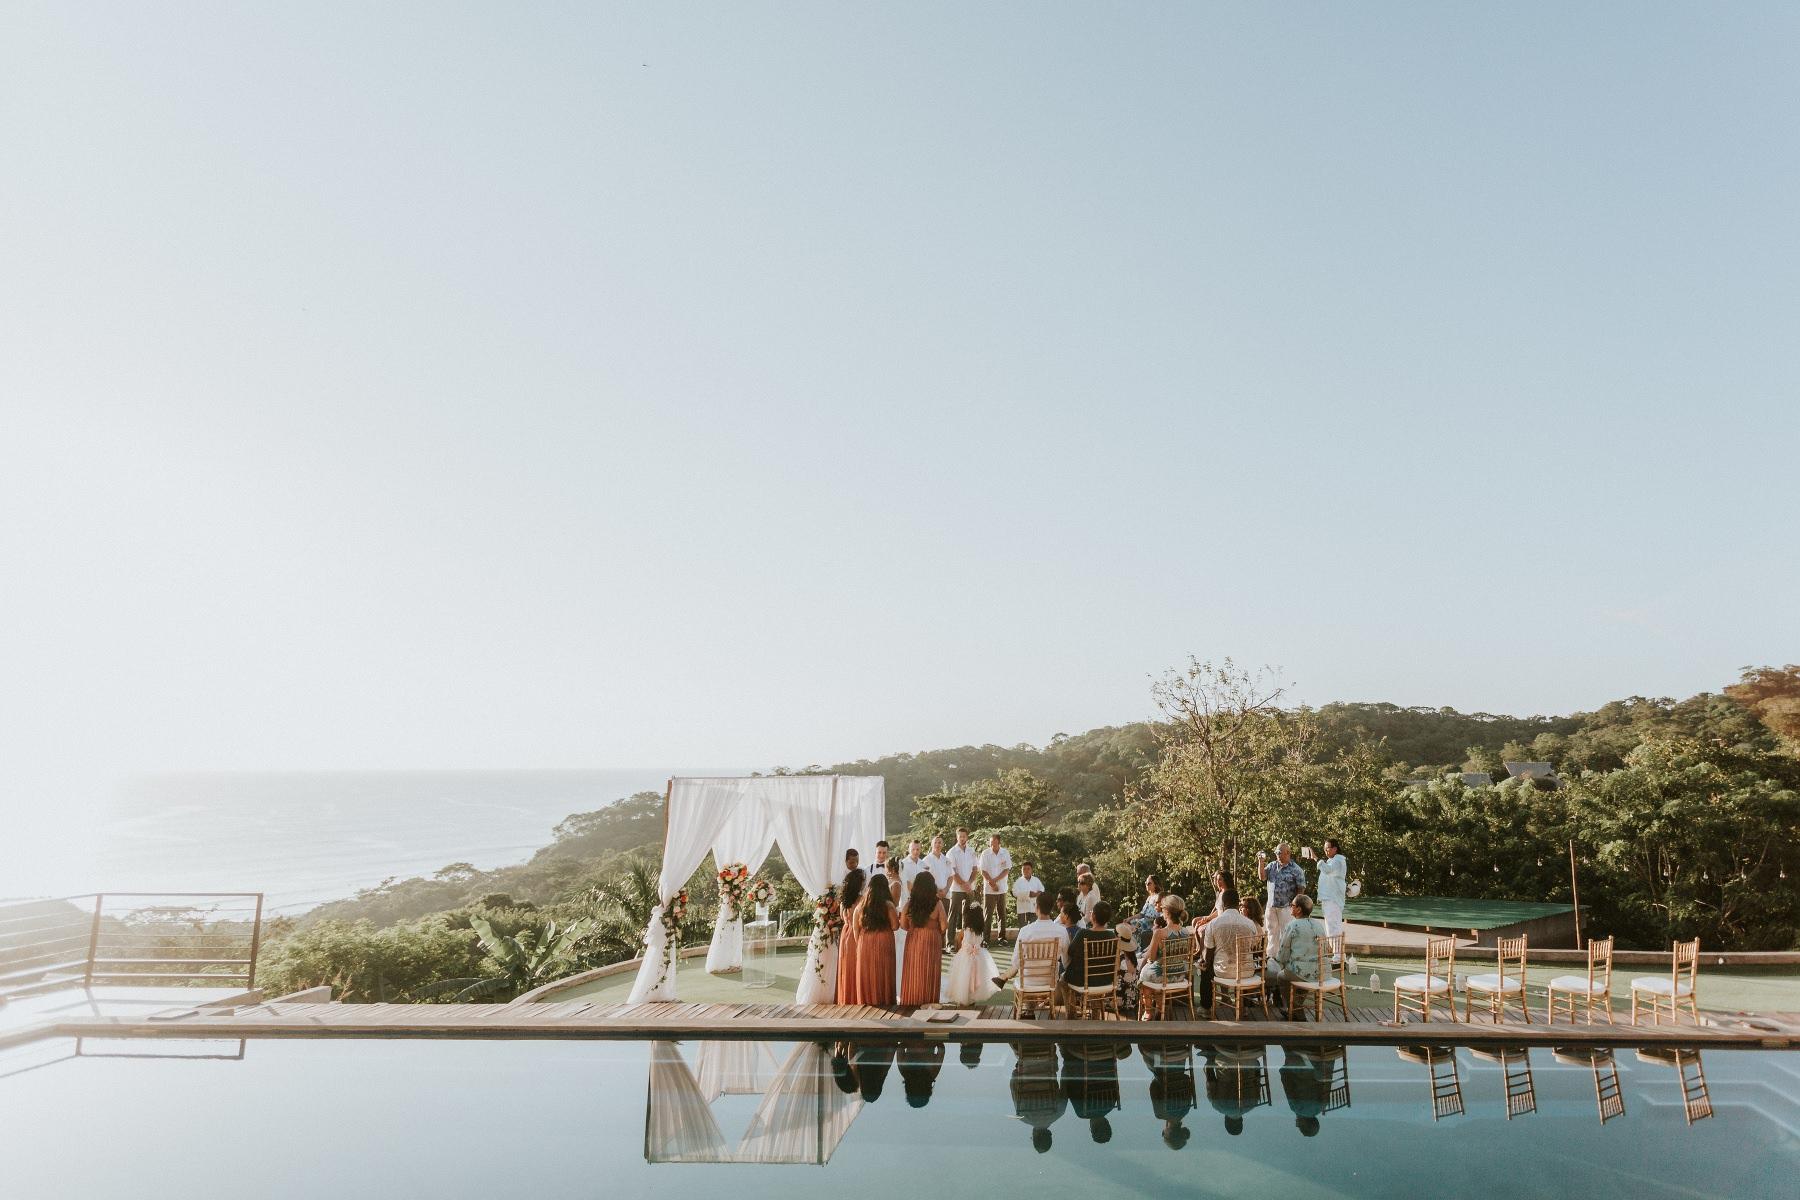 Beach wedding  Nicaragua Costa Rica. Playa Maderas